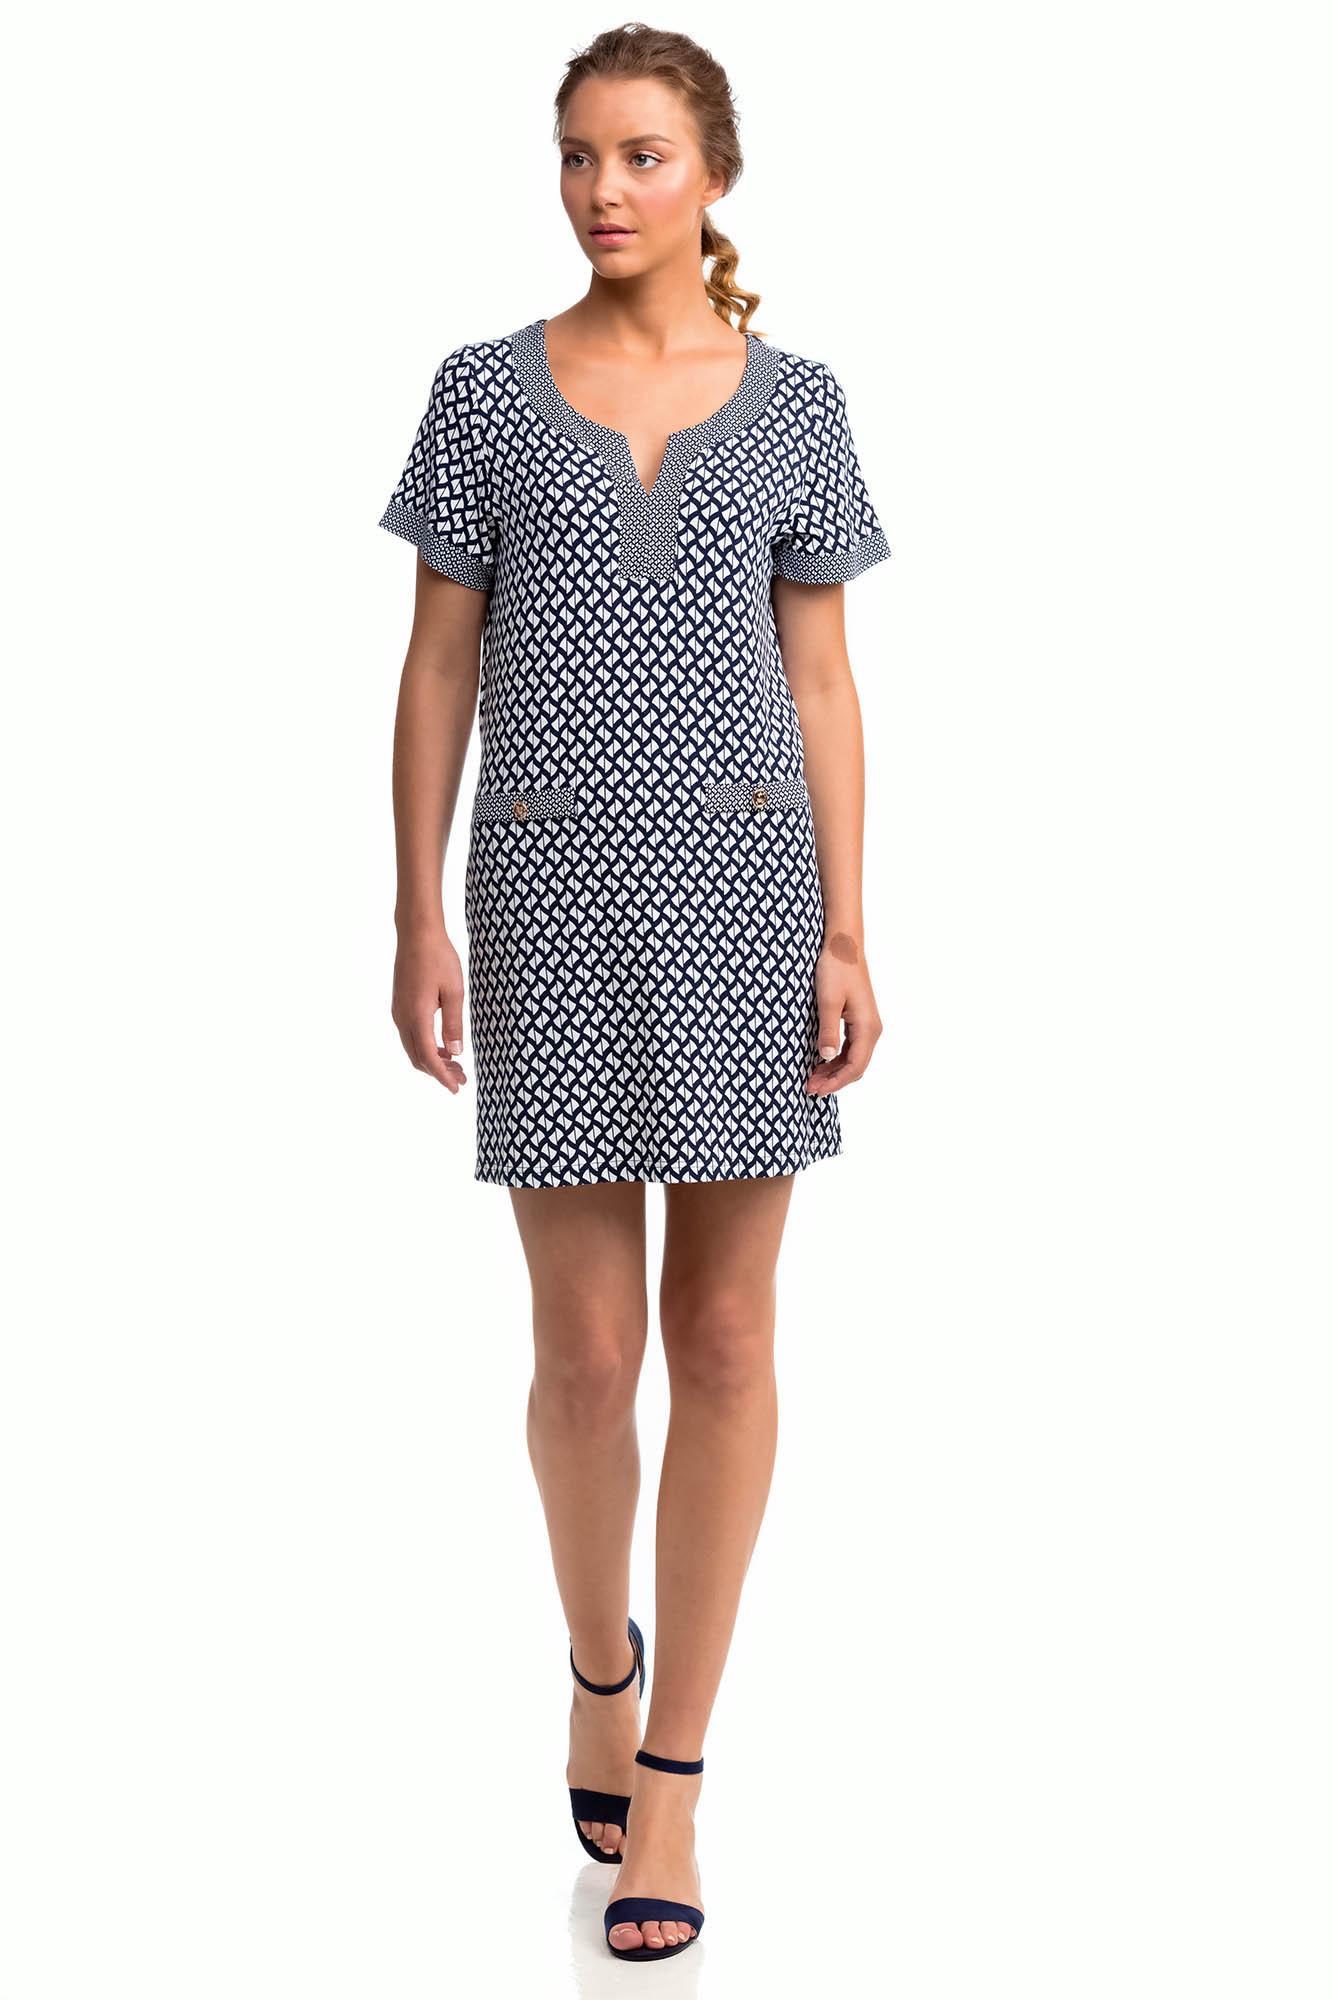 Vamp - Letné dámske šaty 14450 - Vamp blue s